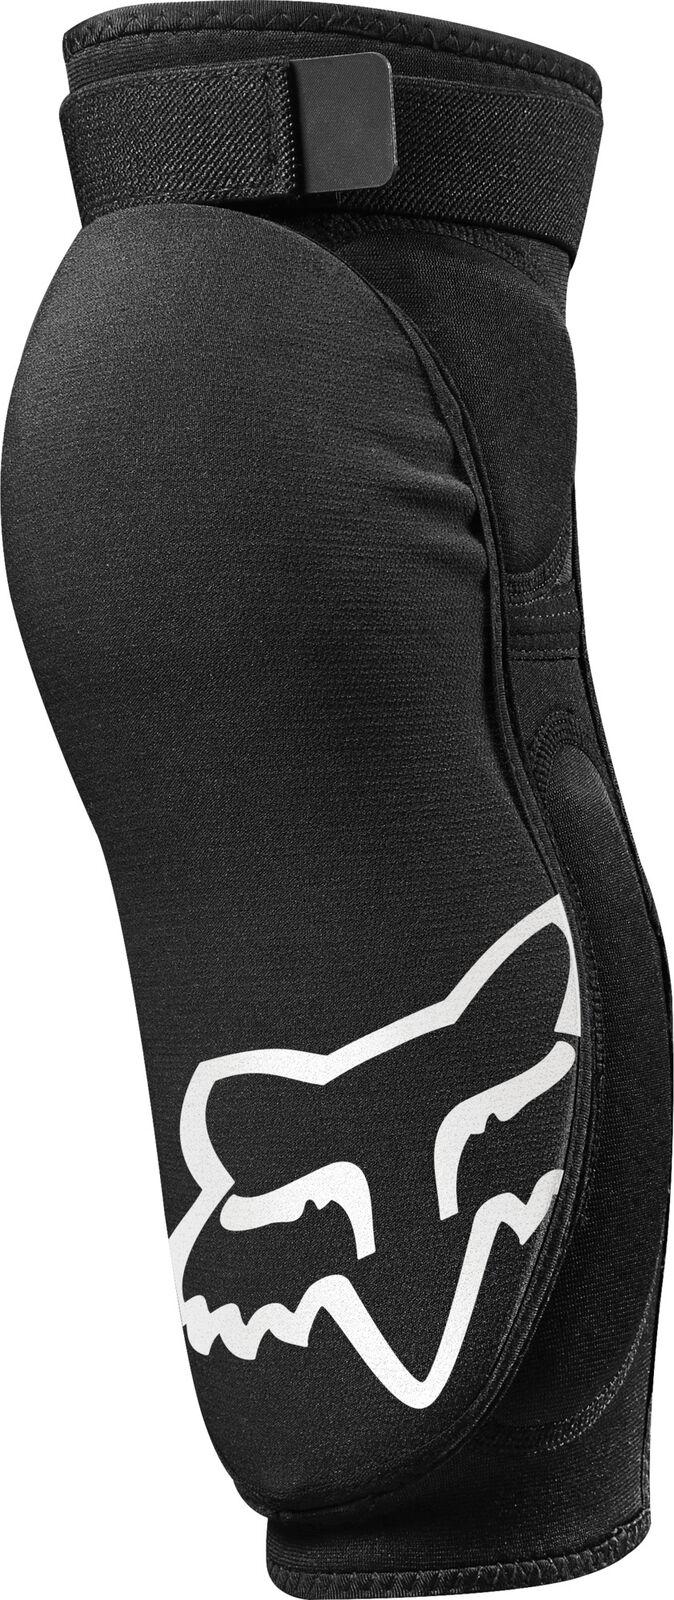 Fox Racing Launch Pro Sport Lightweight Support Wrap Elbow Guard Brace